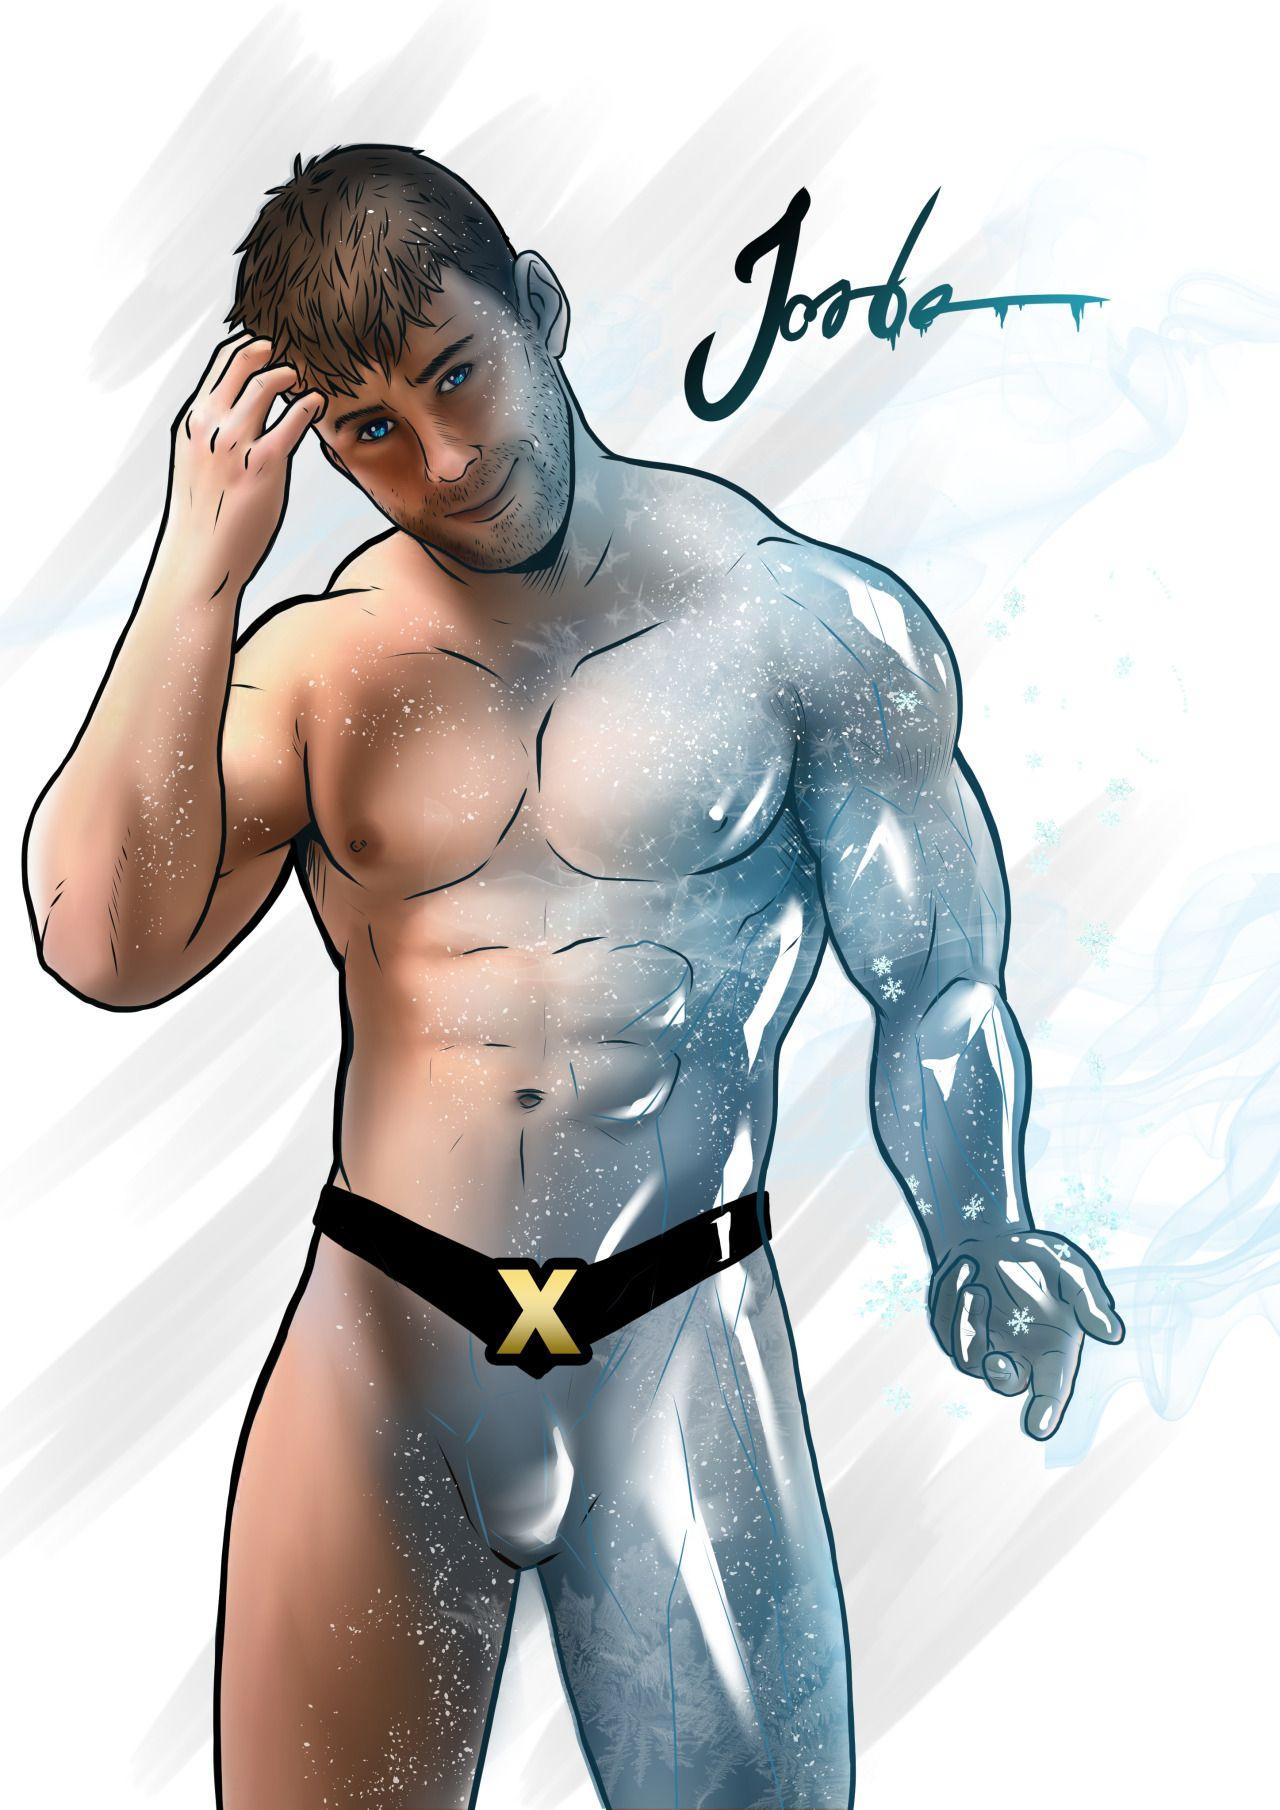 X men gay art erotic opinion